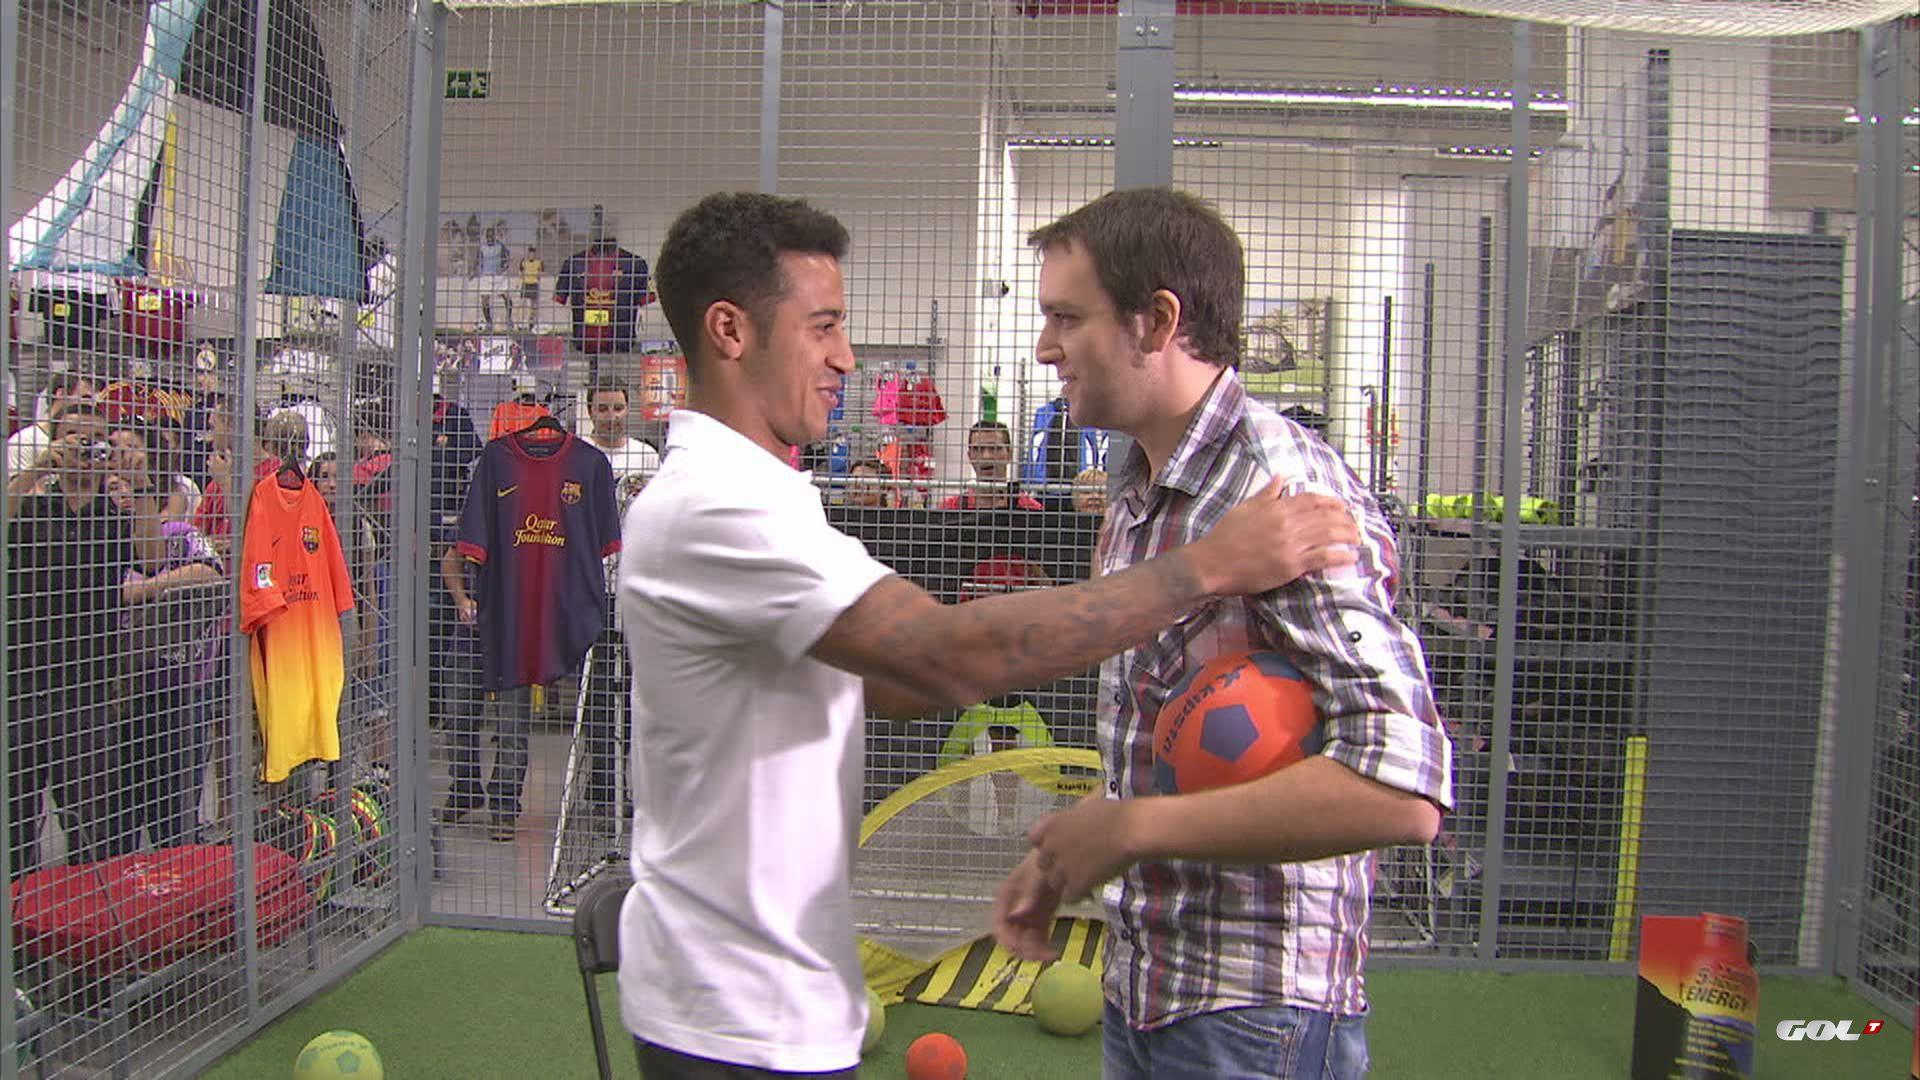 Thiago Alcántara, a Barça footballplayer, talks with our reporter, Rodrigo Fáez. Coming soon in La Liga World.